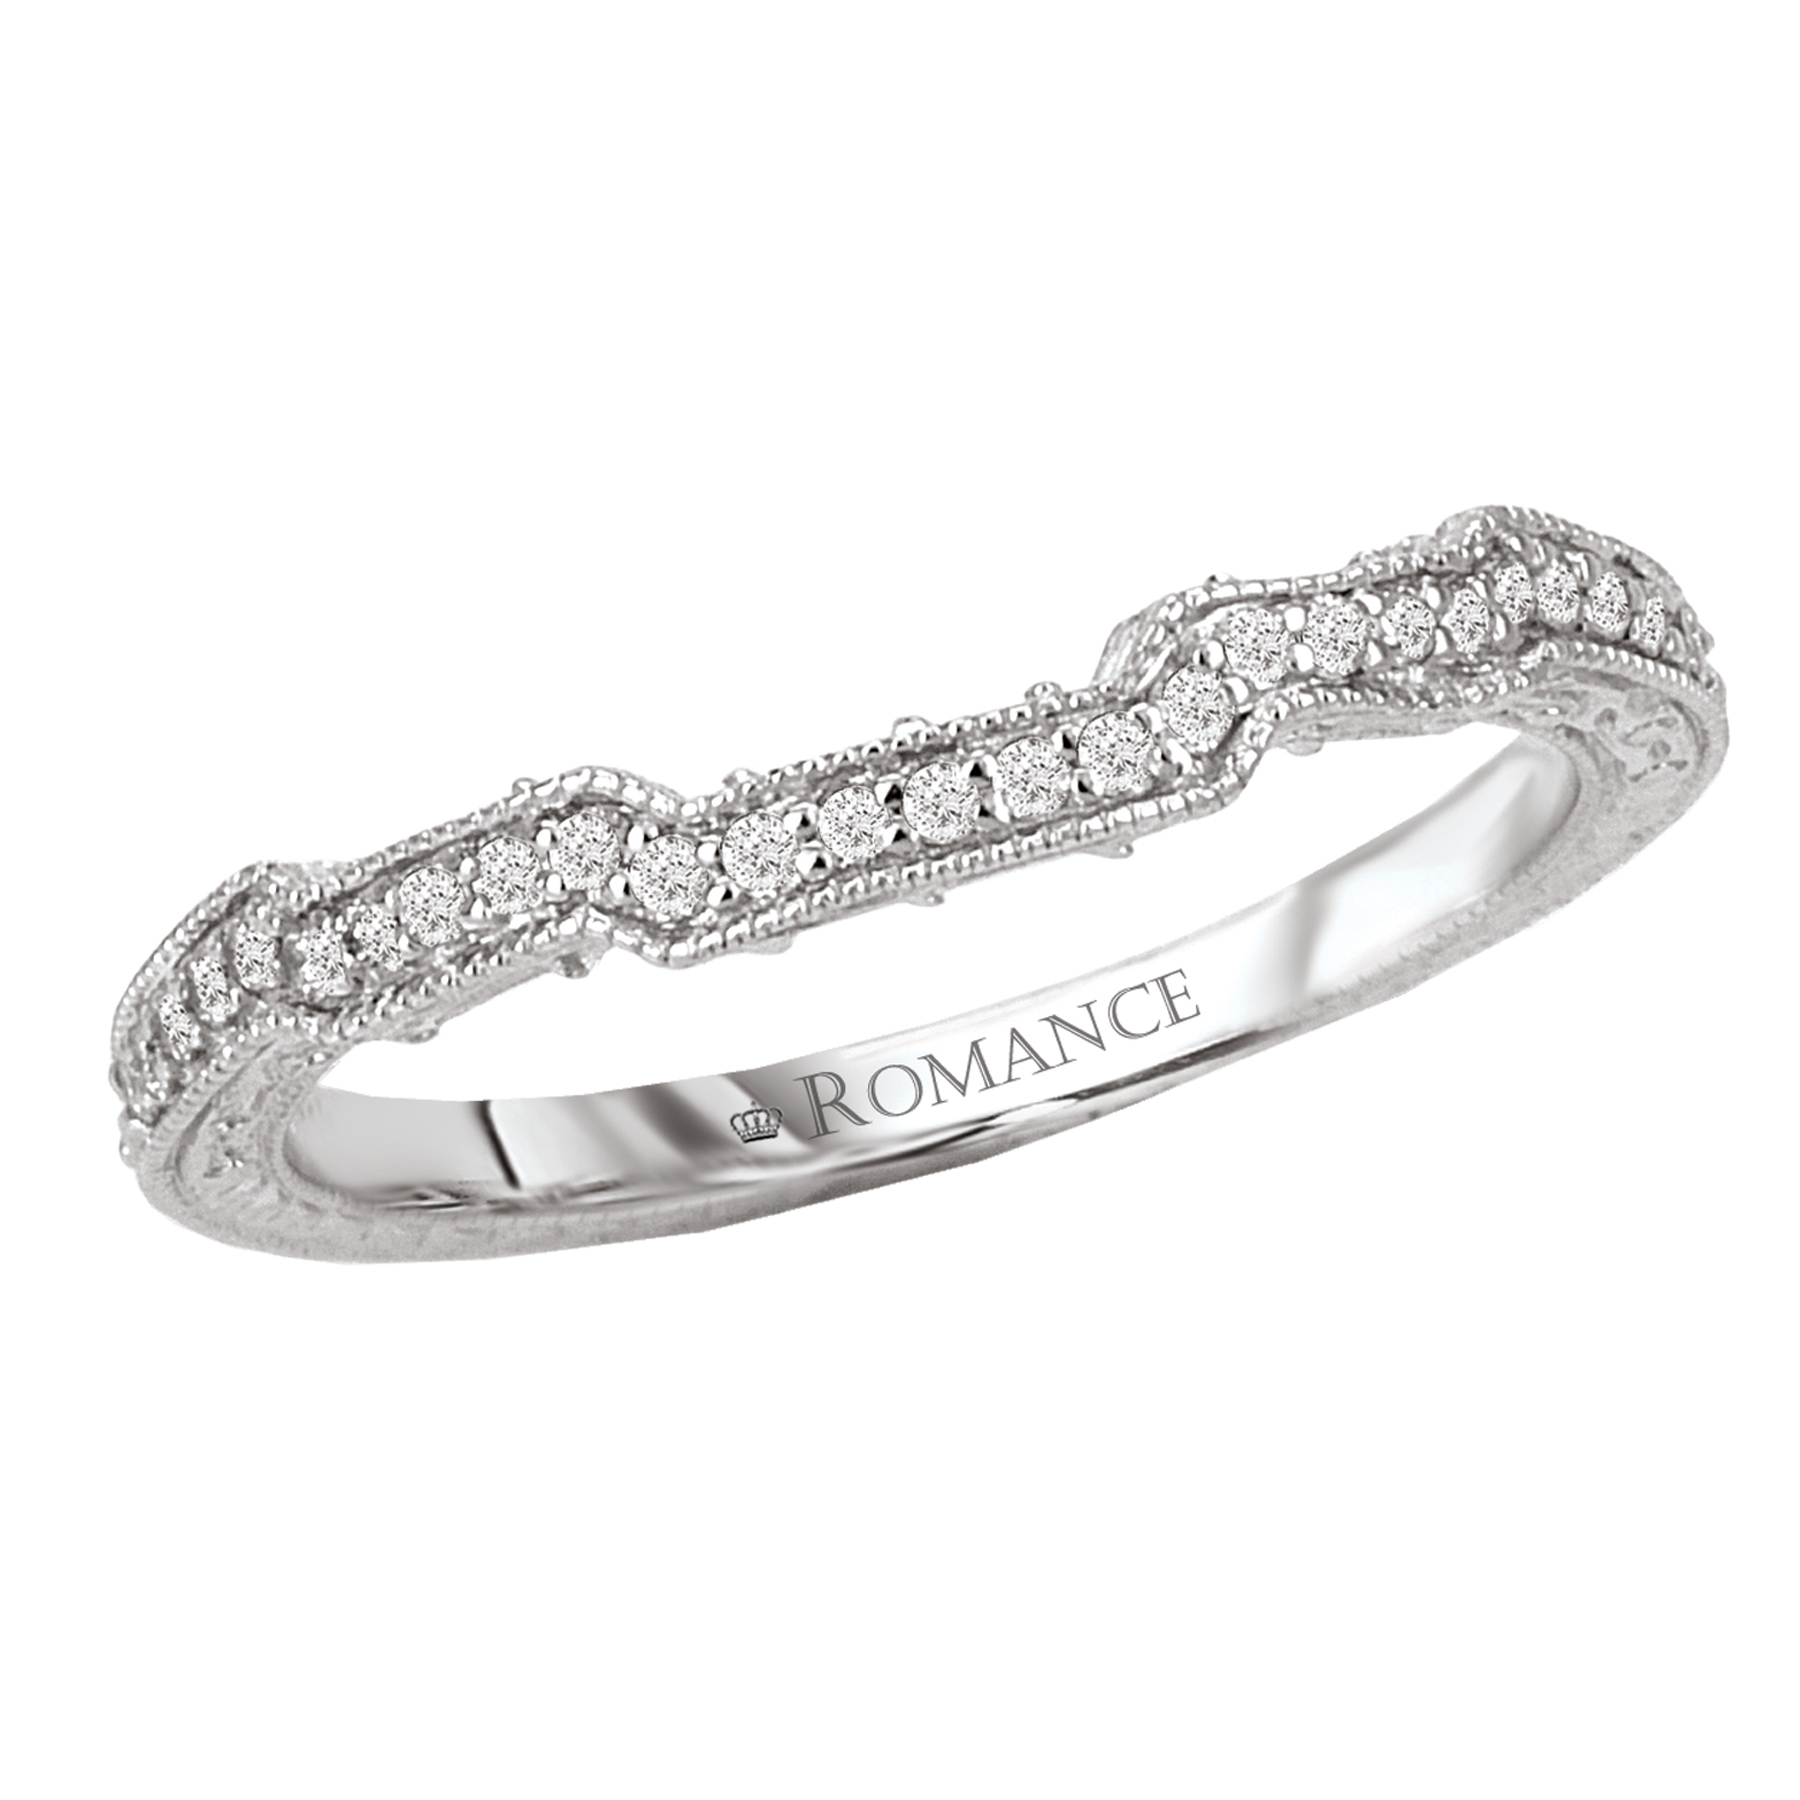 Romantic Bands: Romance Wedding Bands 118209-W